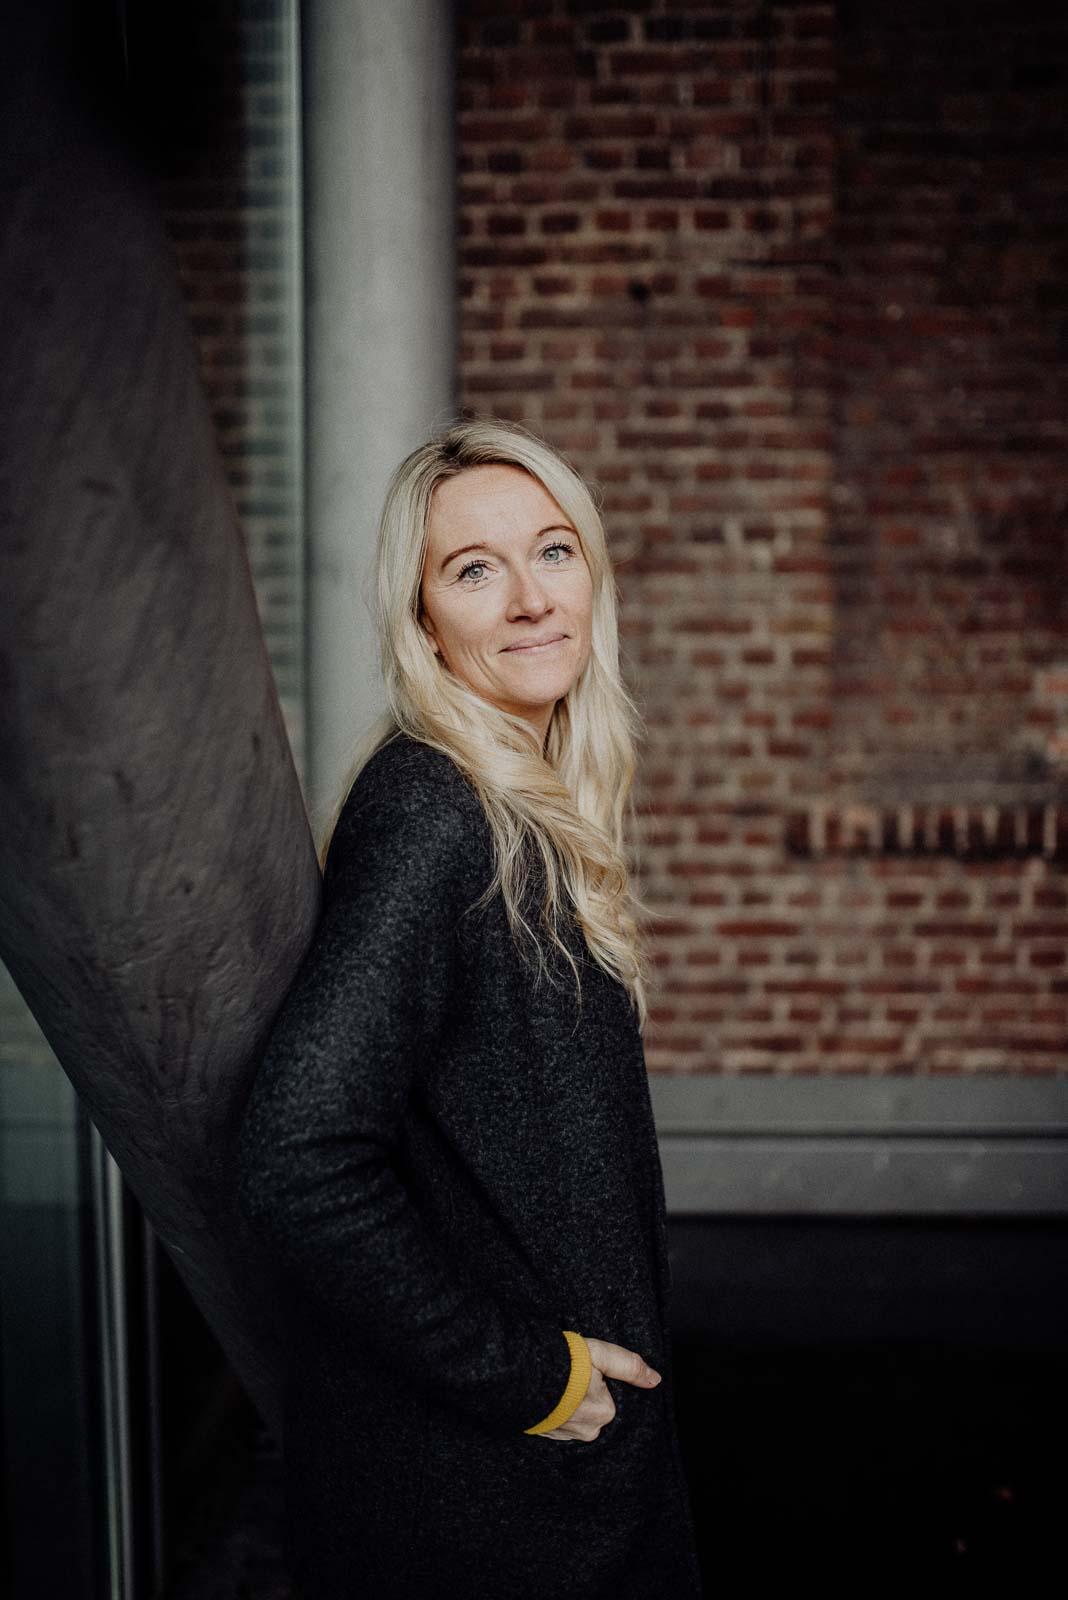 008-fotograf-witten-bochum-businessshooting-urban